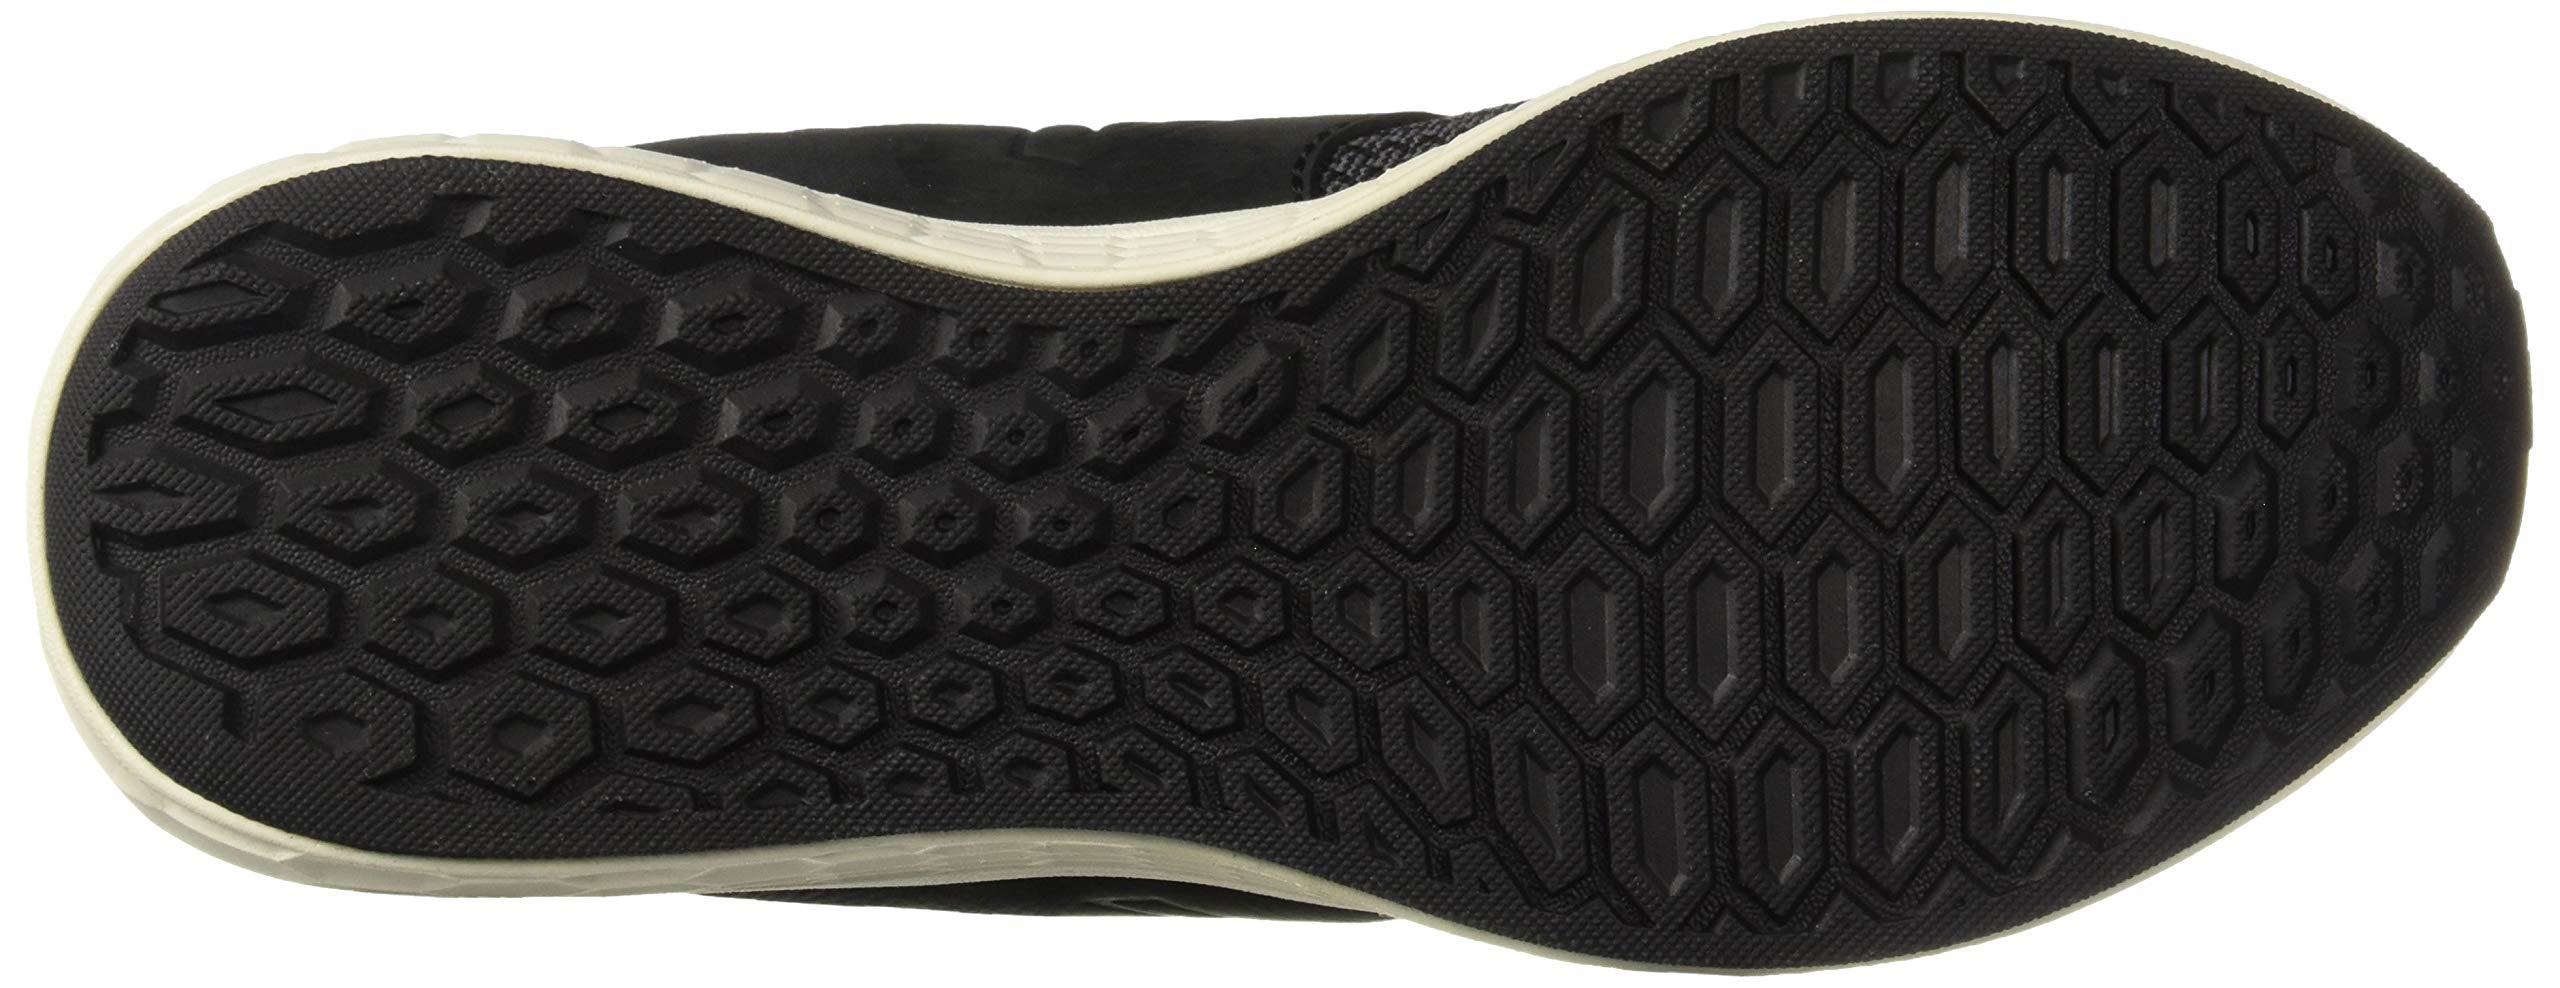 New Balance Women's Cruz V2 Fresh Foam Running Shoe Black/Magnet 5 B US by New Balance (Image #3)